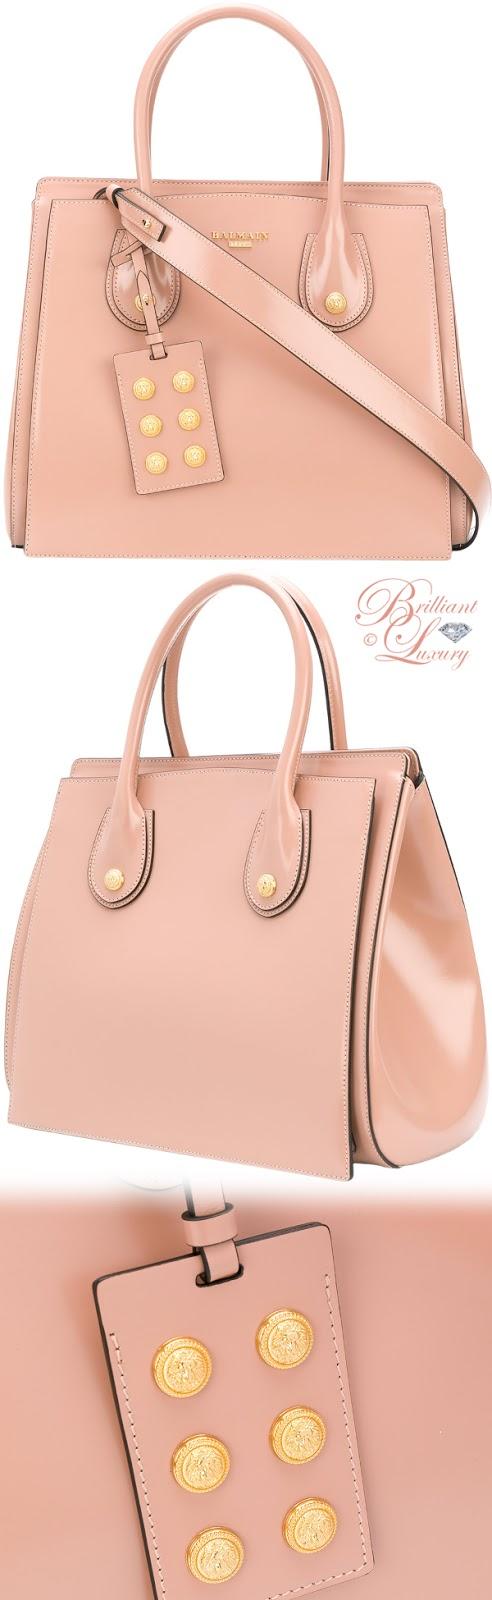 Brilliant Luxury ♦ Balmain top handle tote